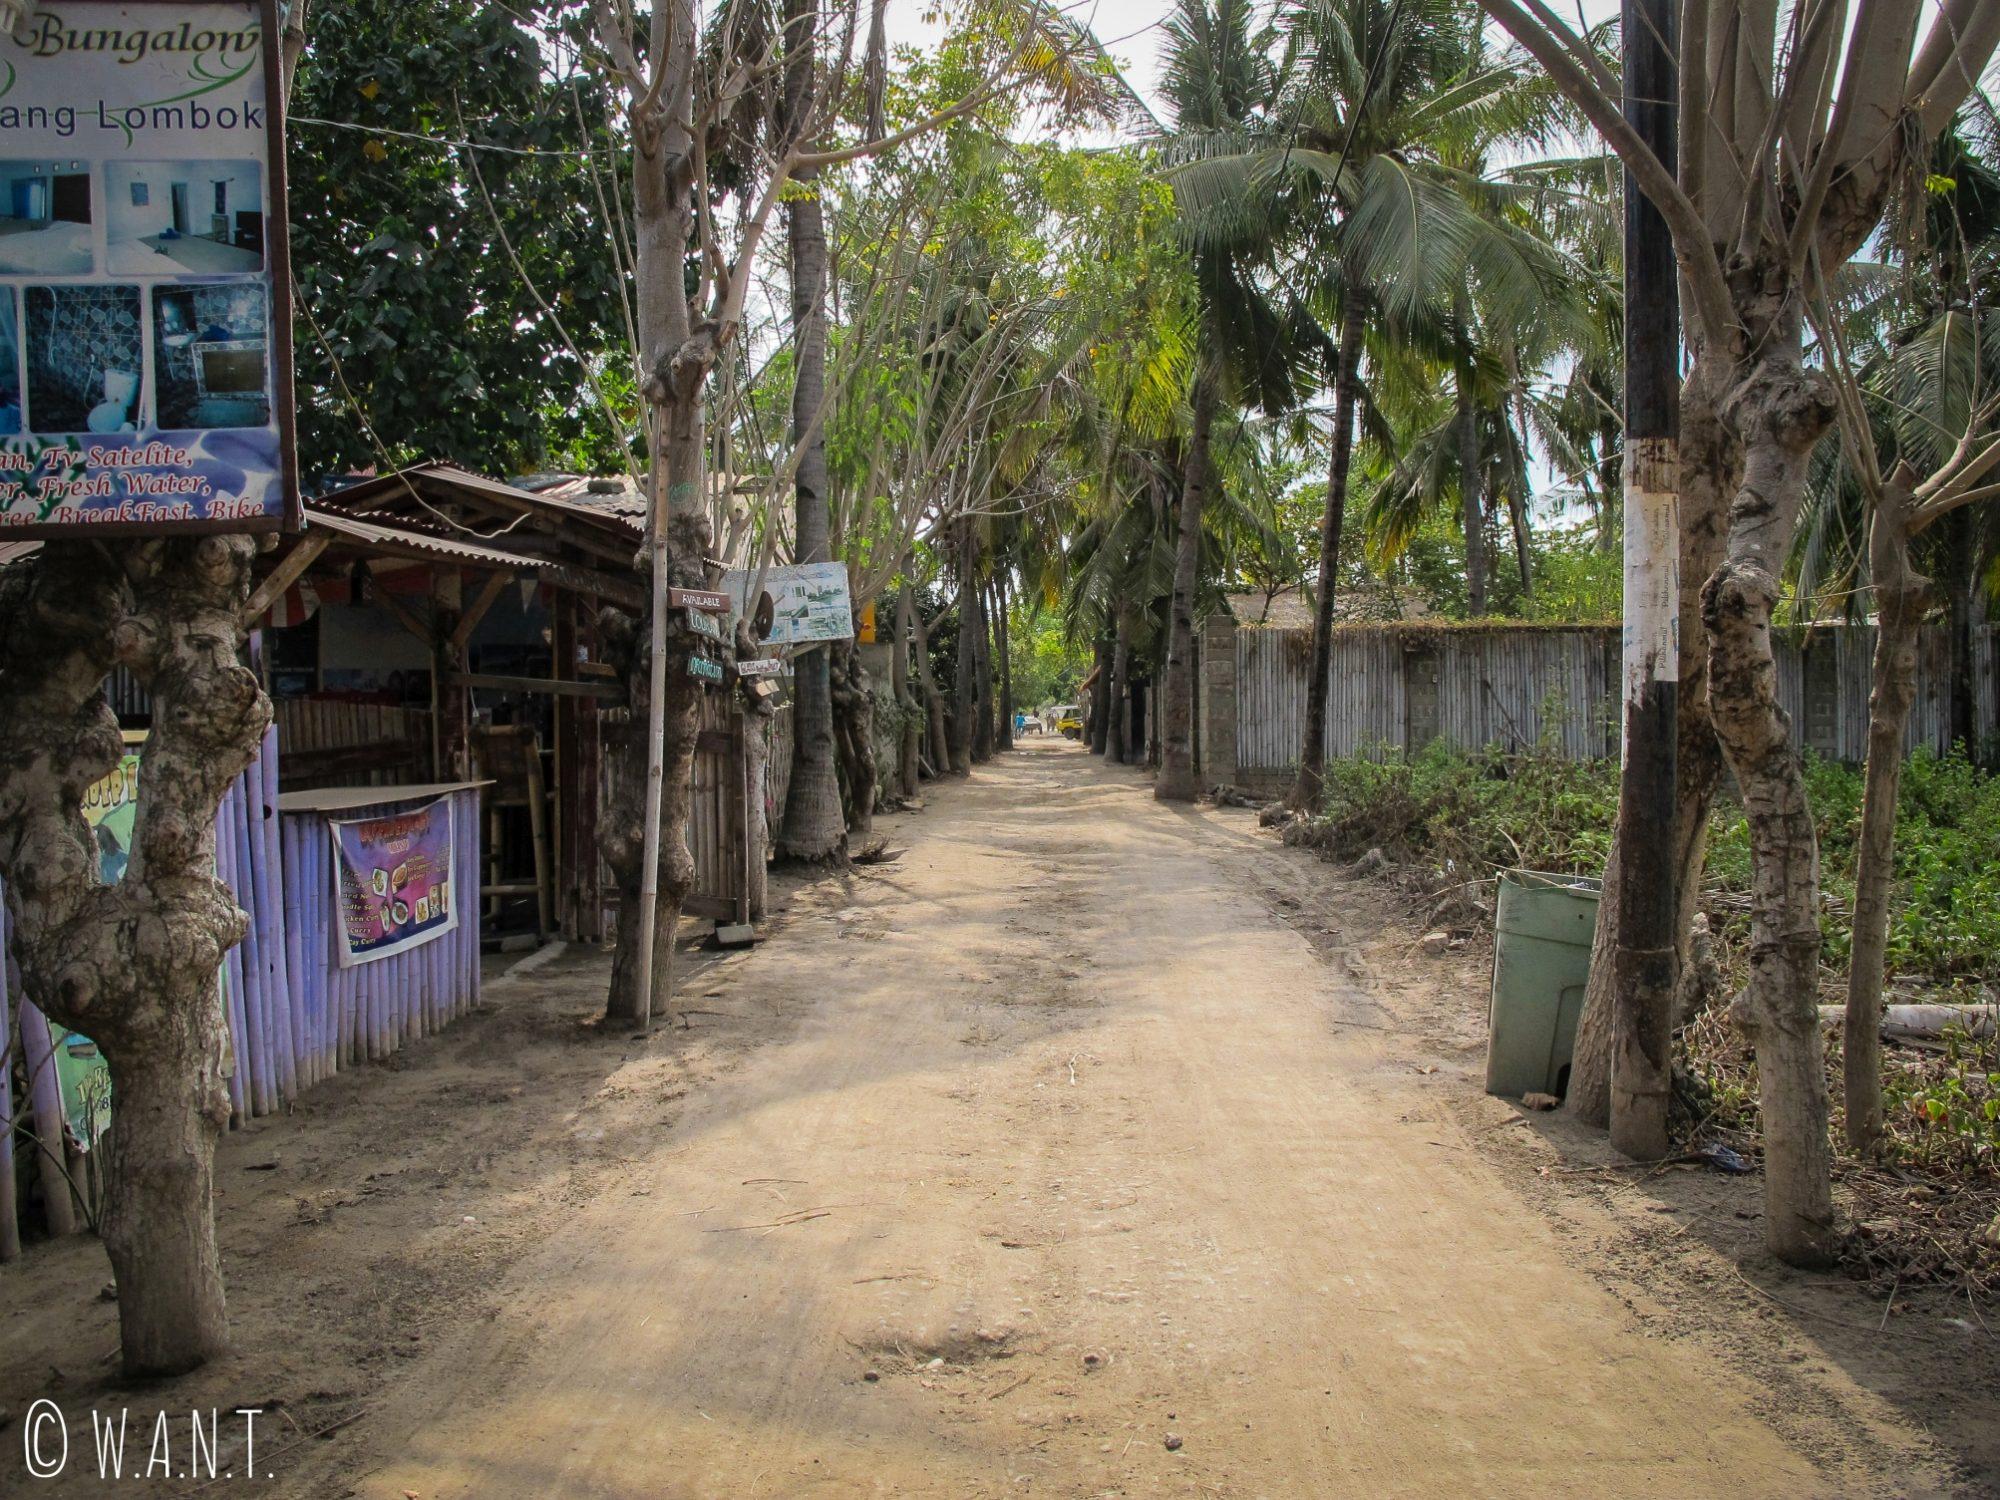 2017 - Allée du centre de l'île de Gili Trawangan